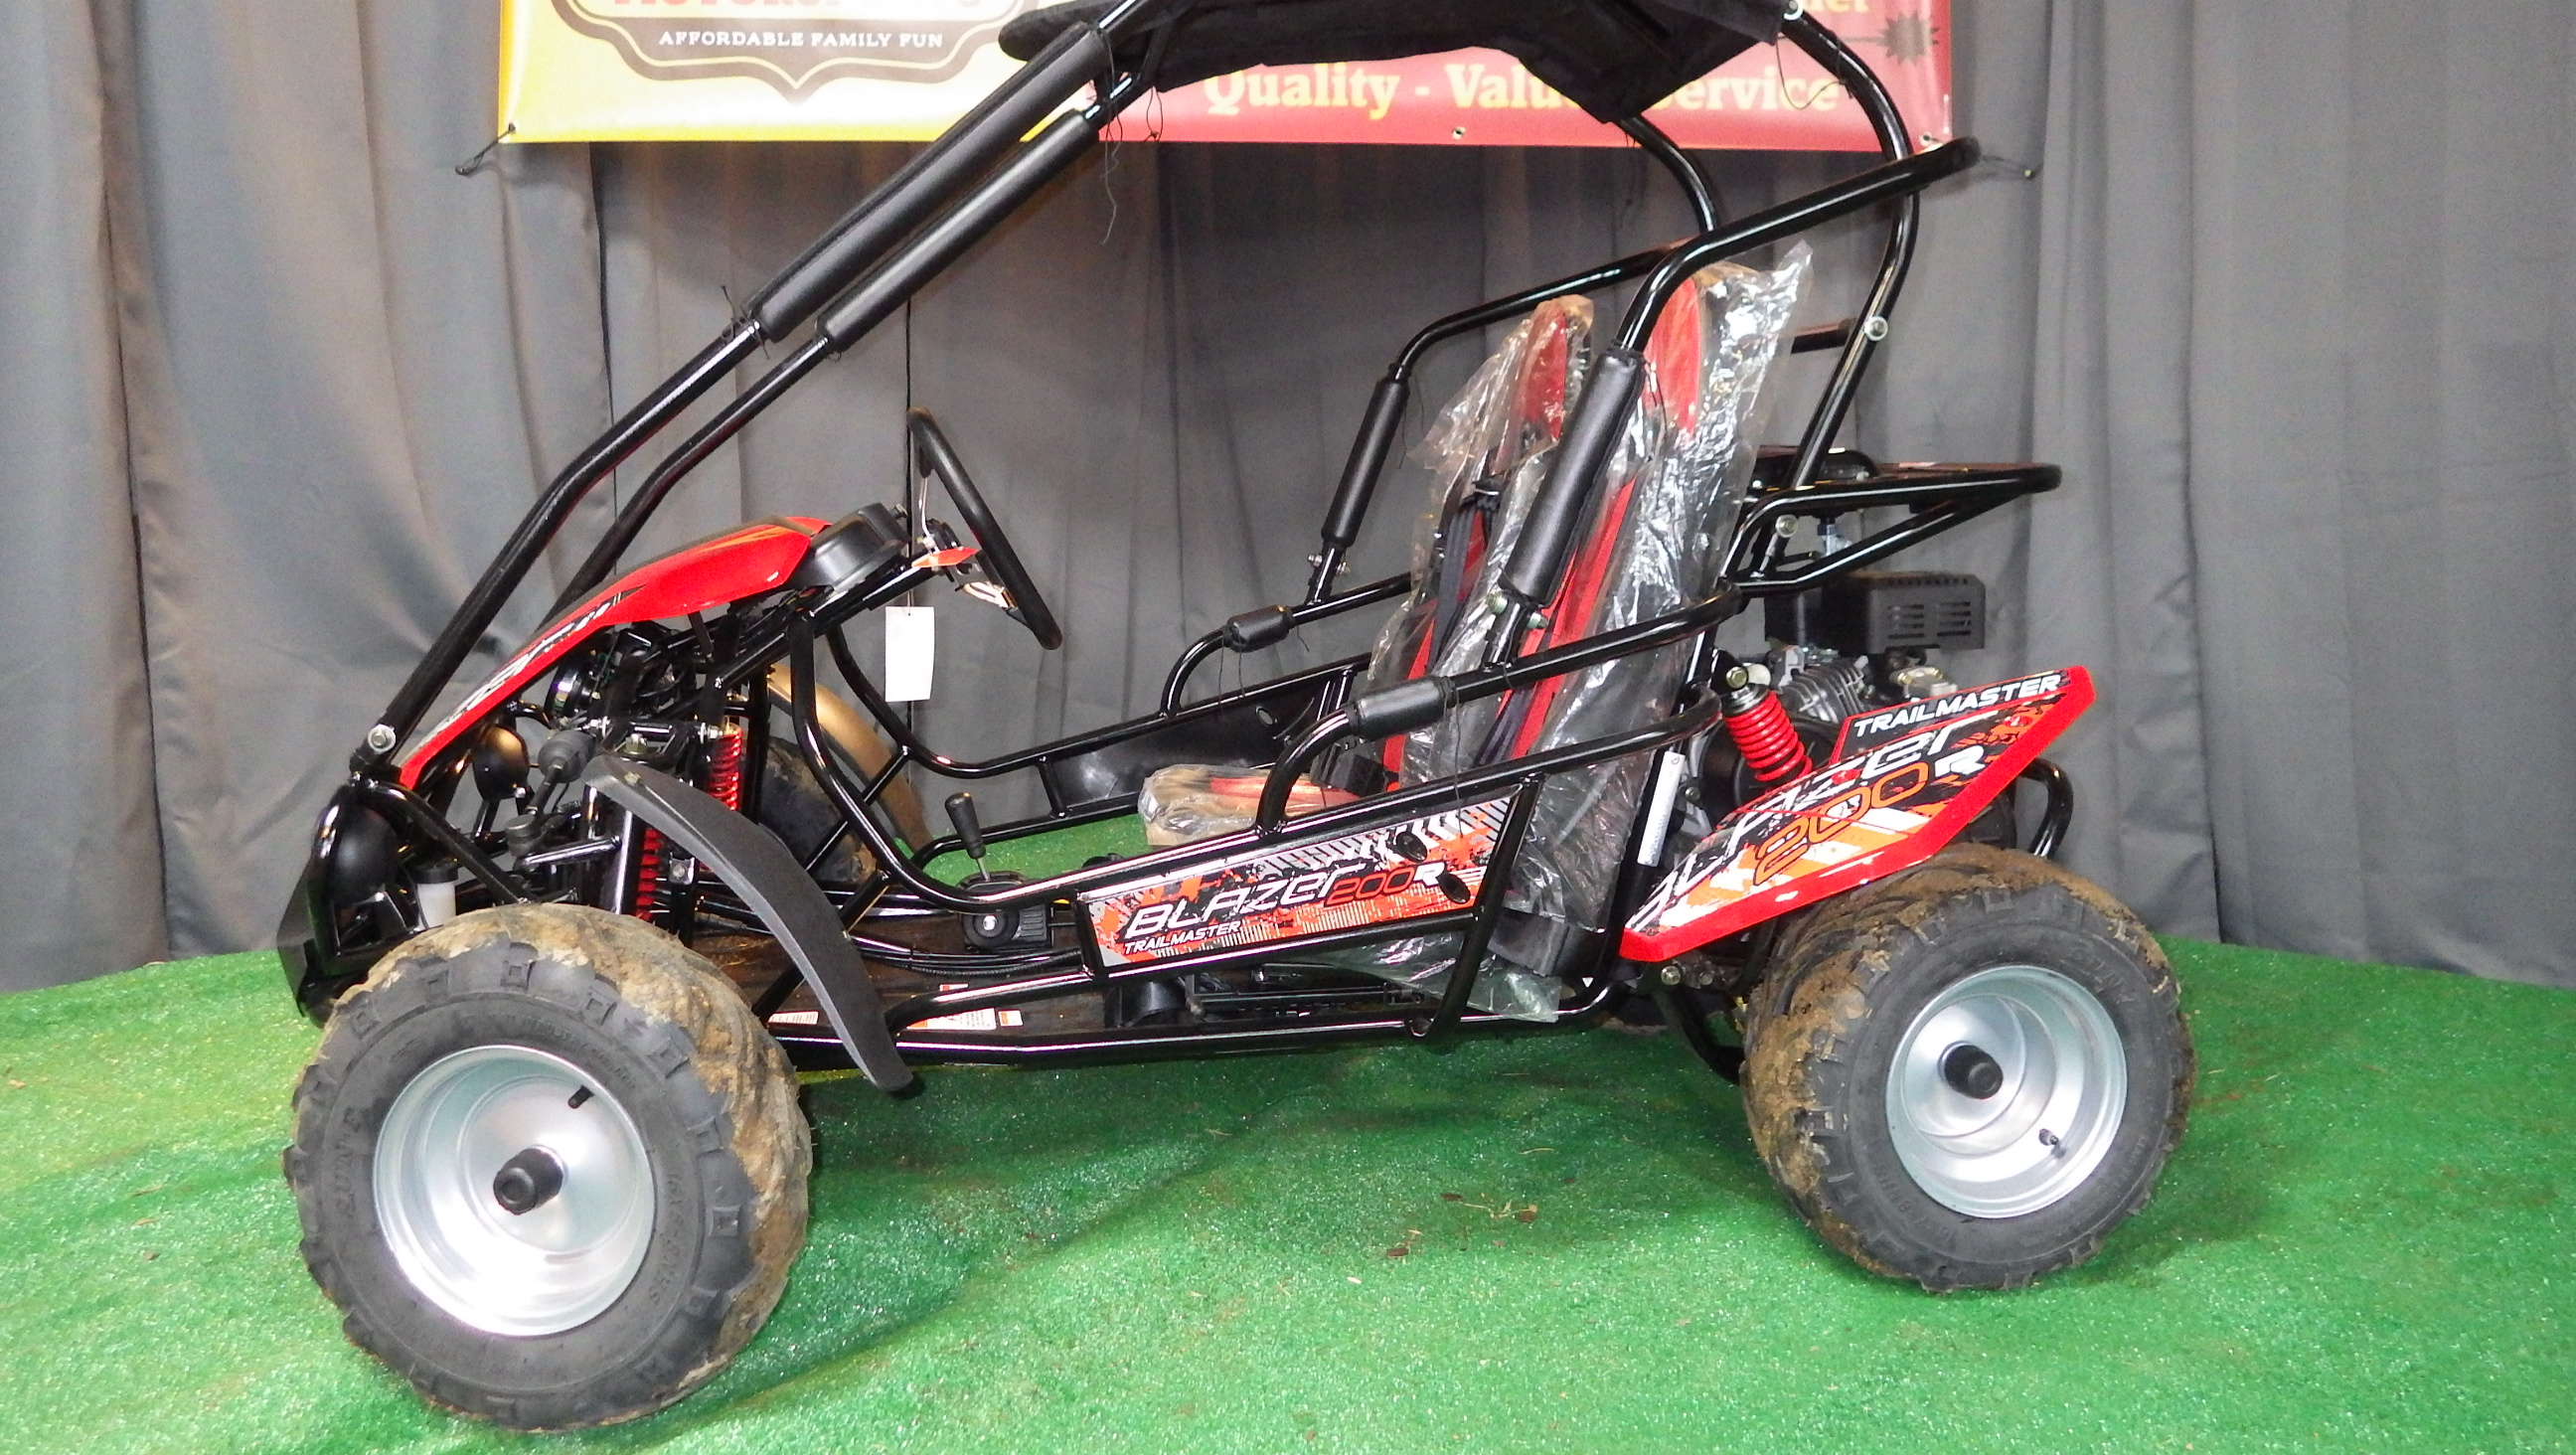 Blazer 200R left